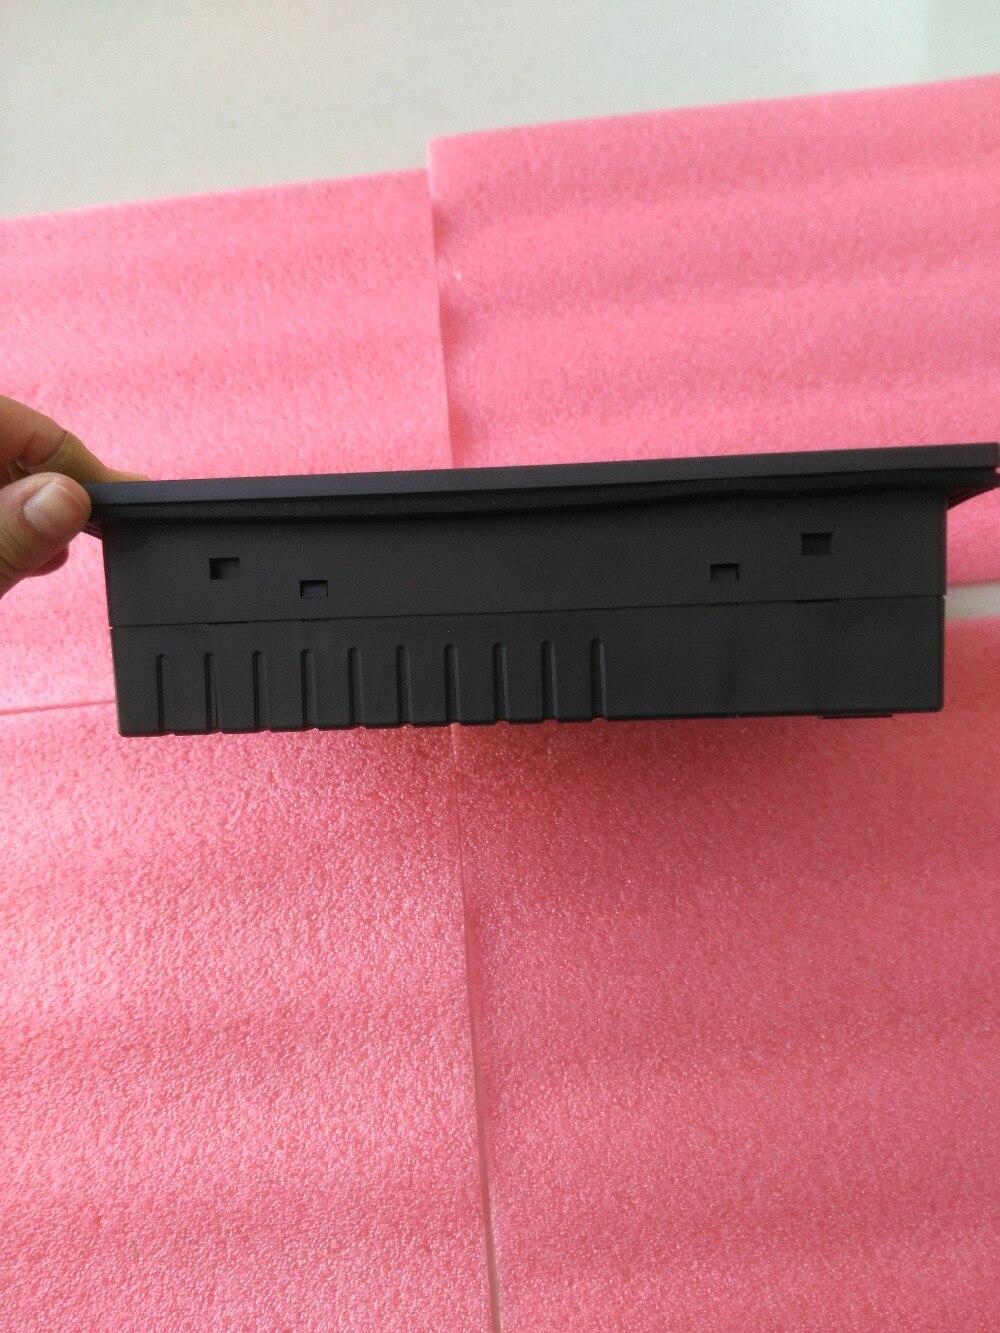 цена на DOP-B07S411 Delta 7 inch 800x480 HMI touch screen panel